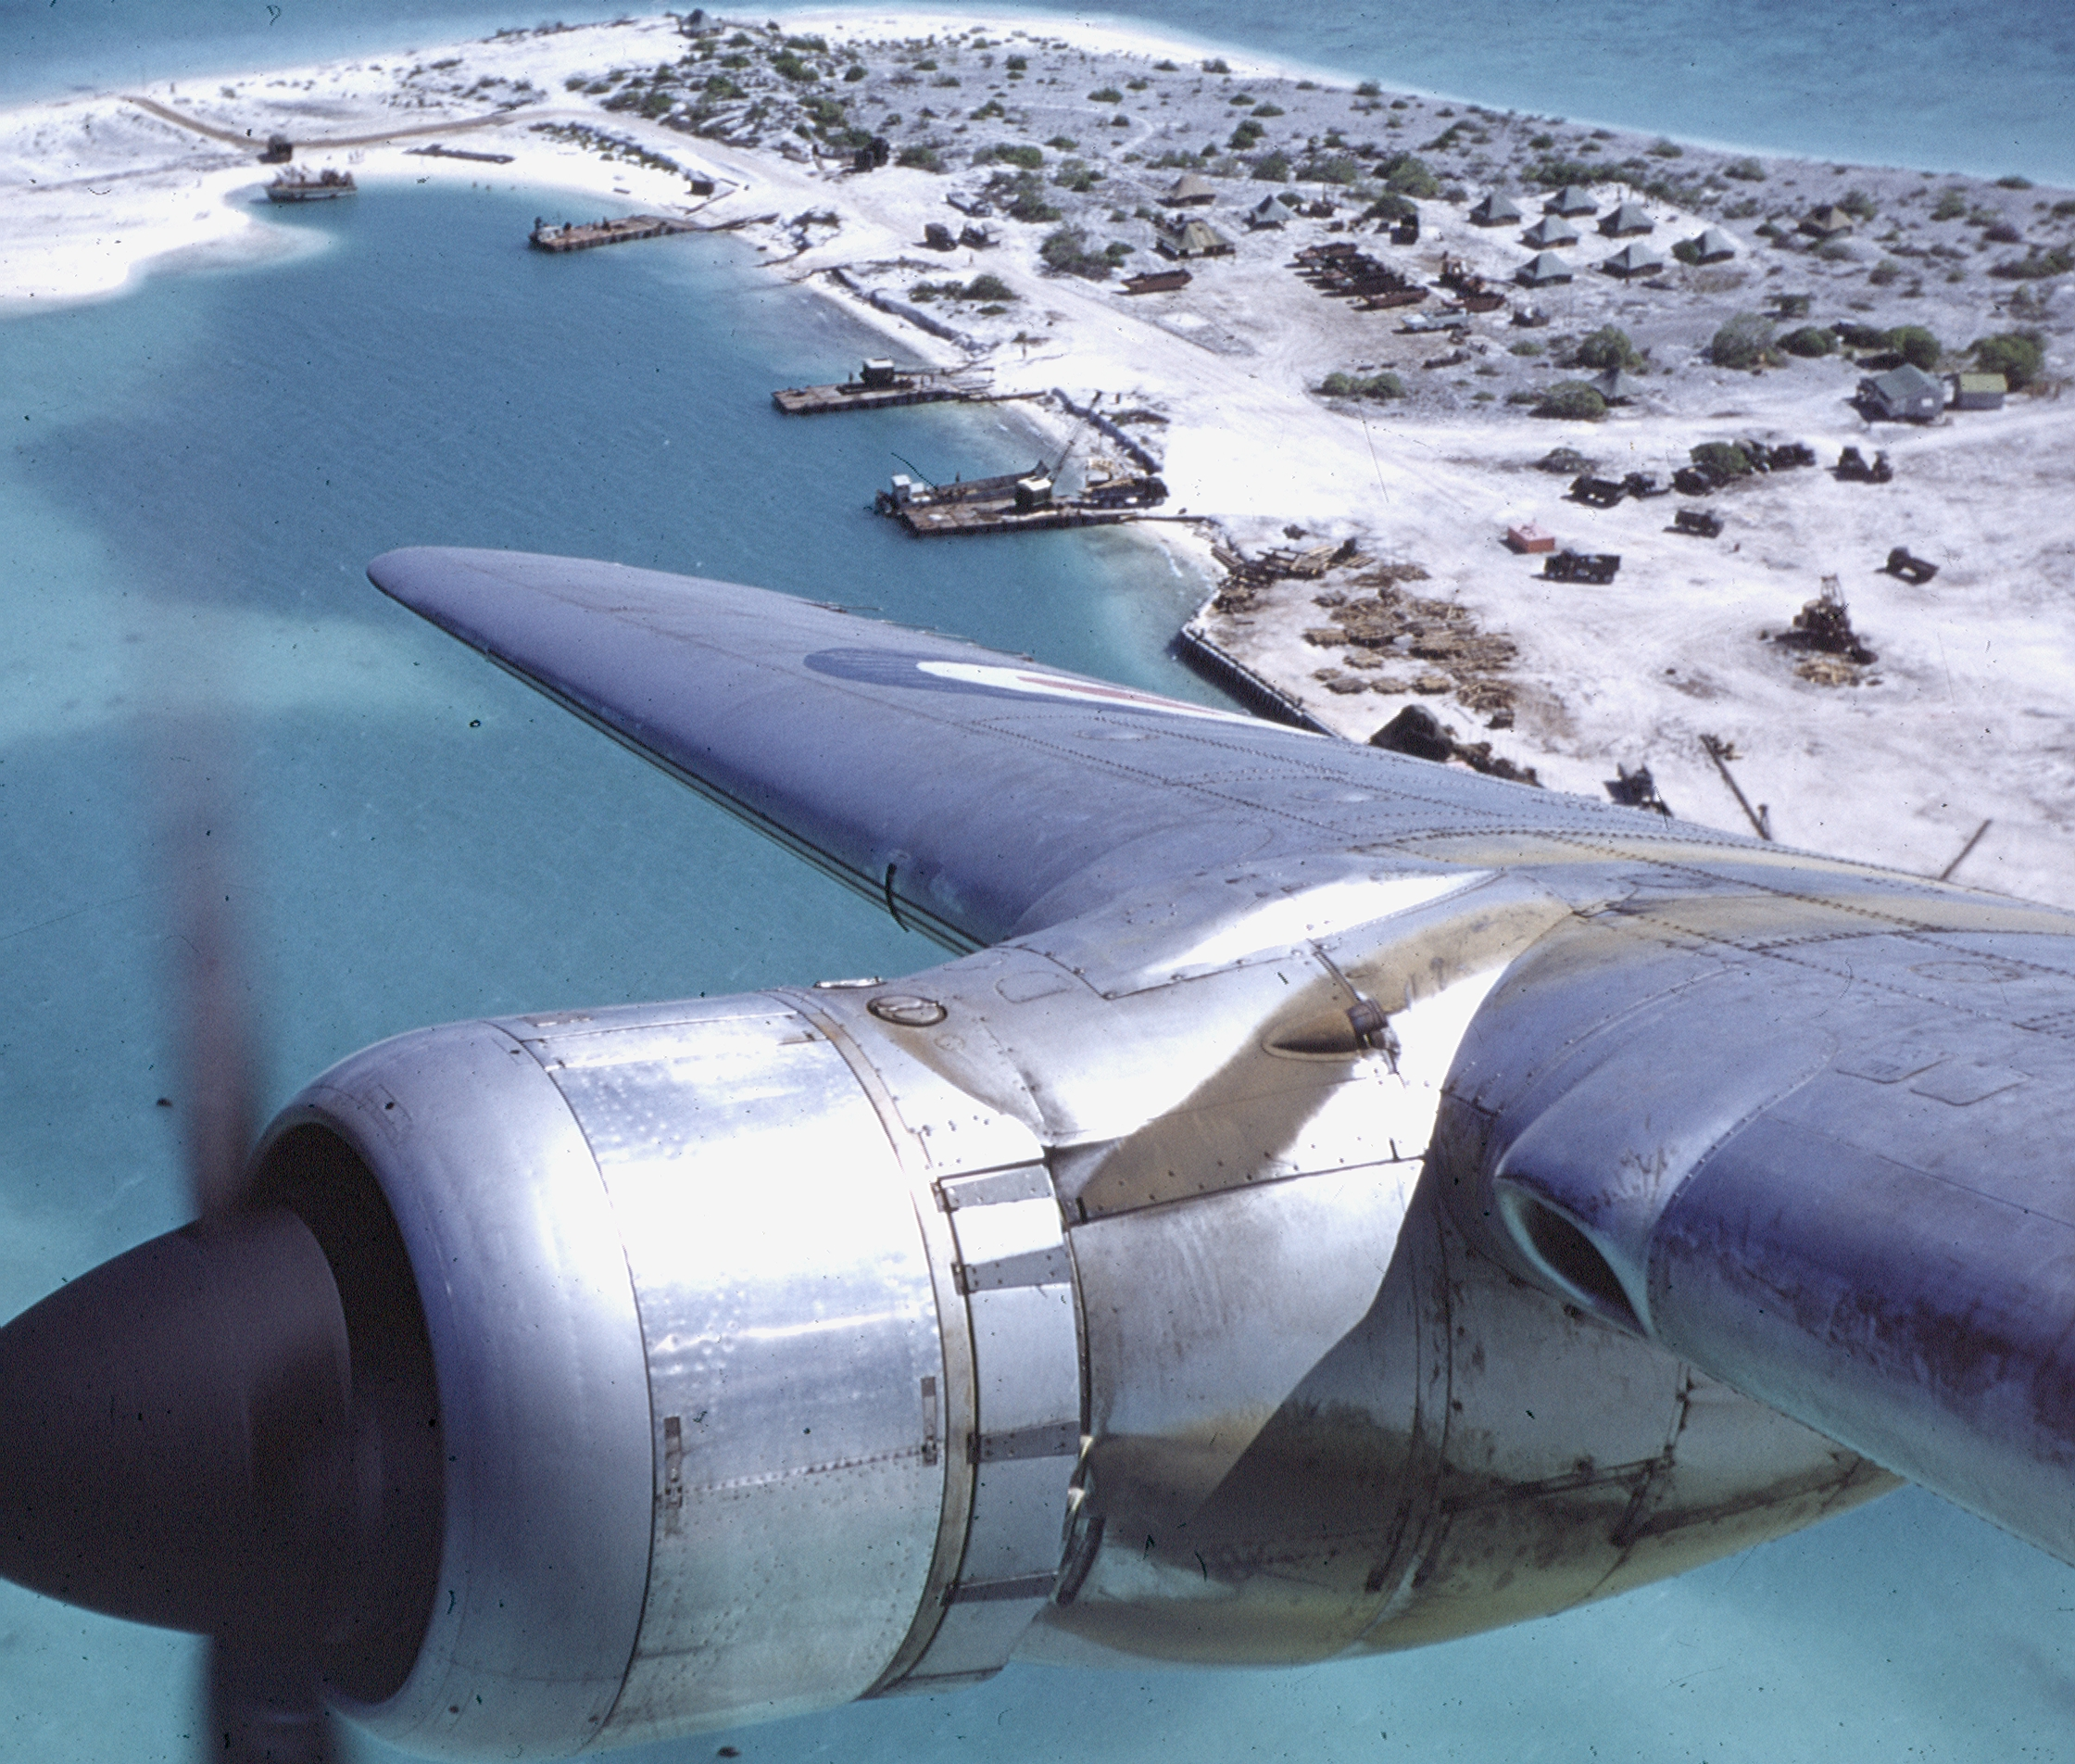 File:Hastings TG 582 over London, Xmas Island Aug 1956.jpg ...